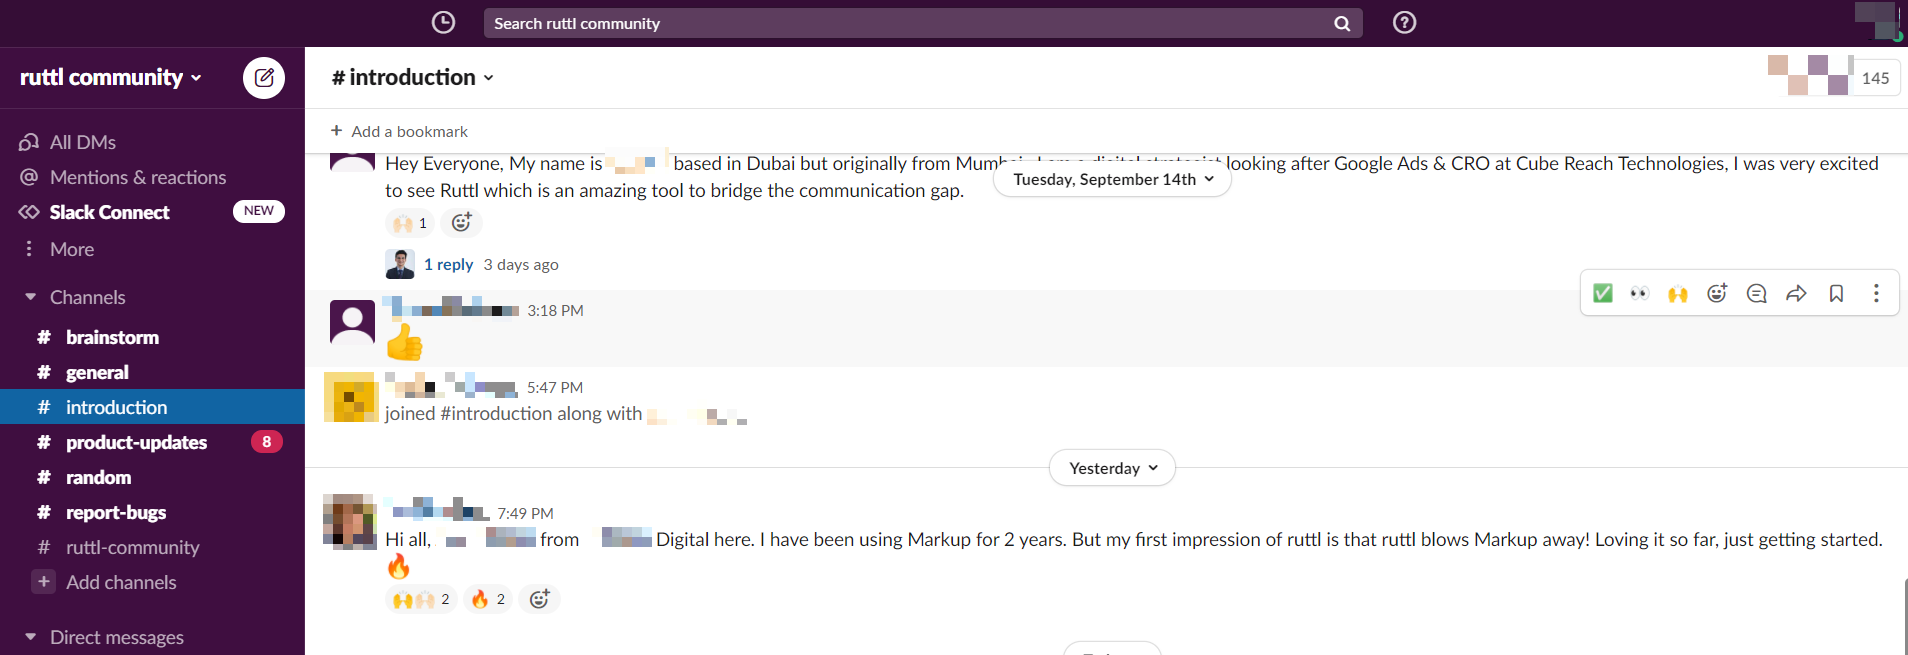 Ruttl feedback image